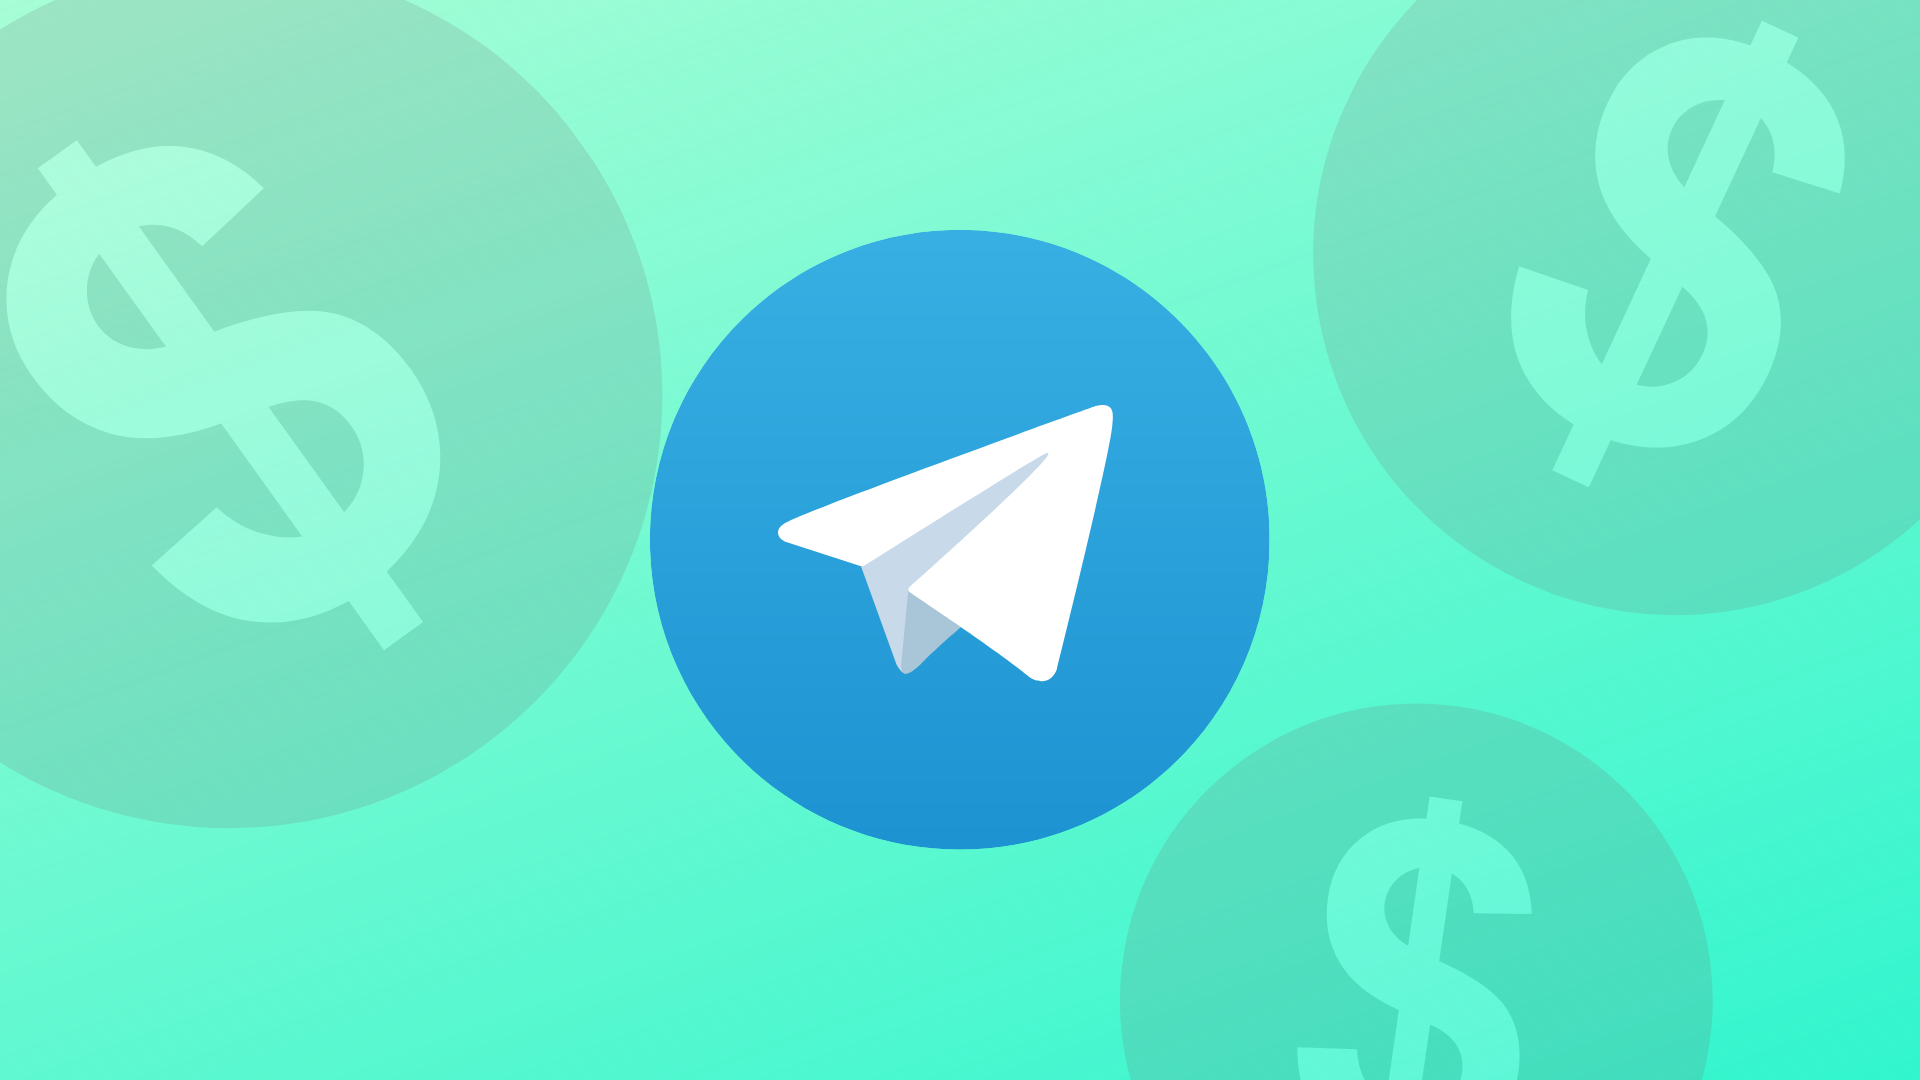 Монетизация Телеграма: ещё одна гипотеза